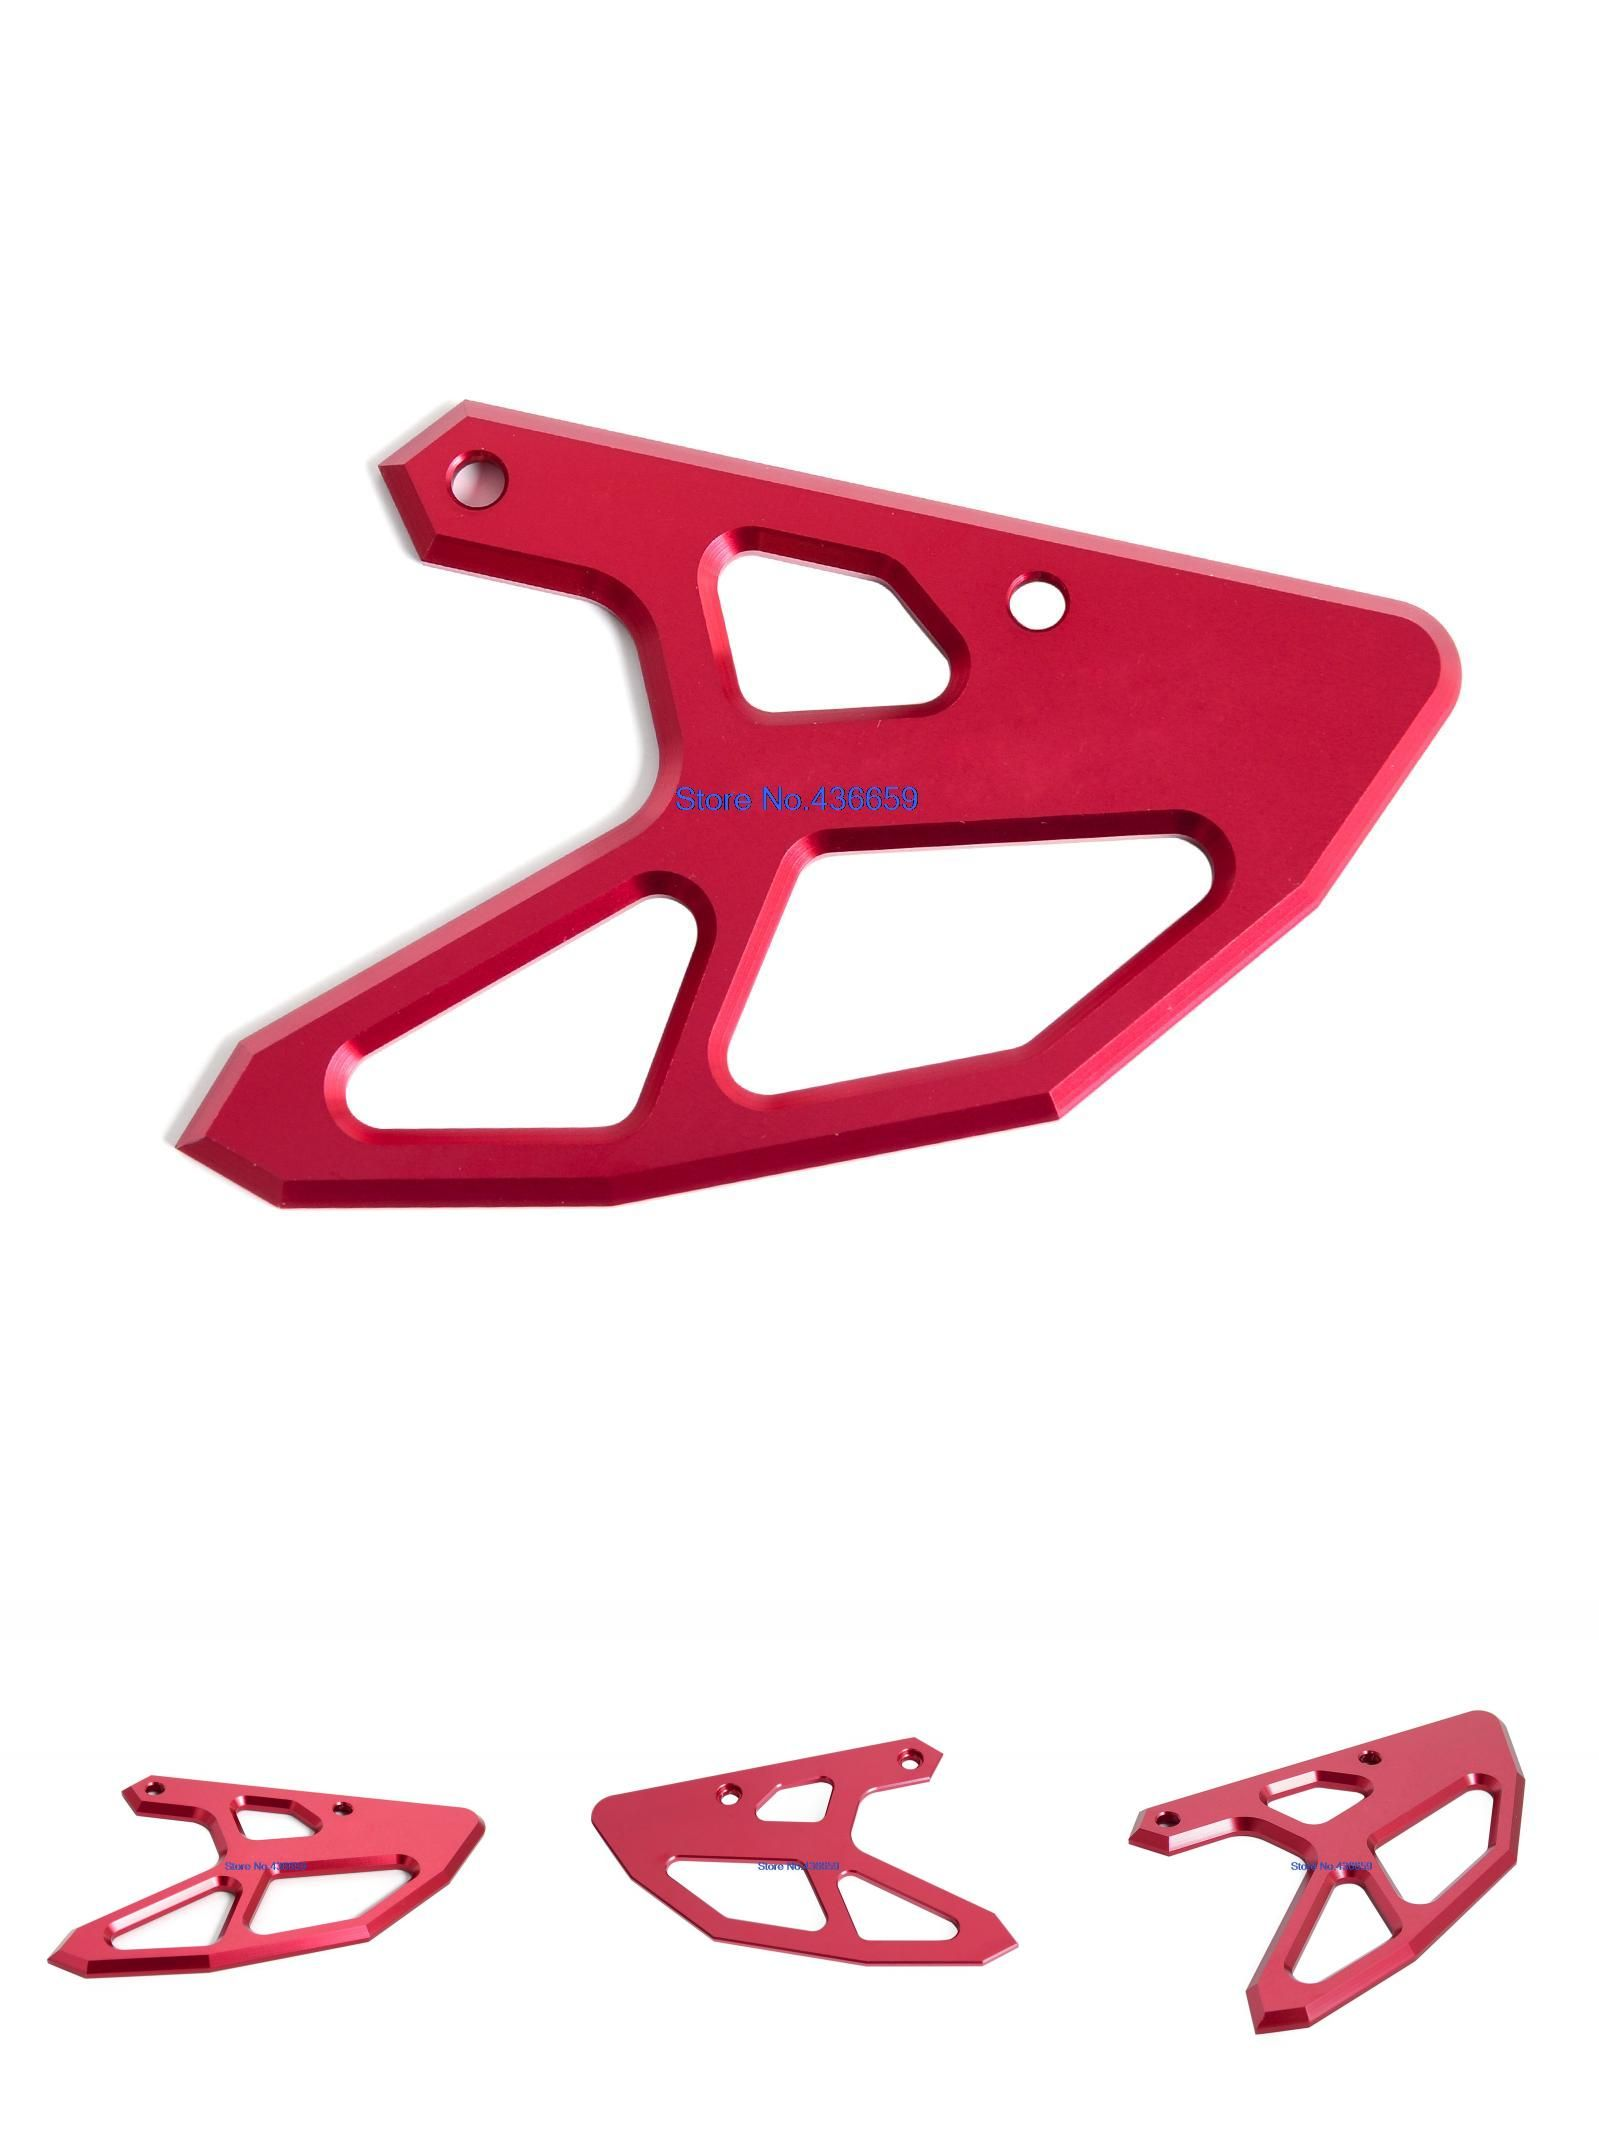 Fit Honda CRF450R 450X CRF250R 250X 2002-2016 2017 CNC Brake Reservoir Cover Cap